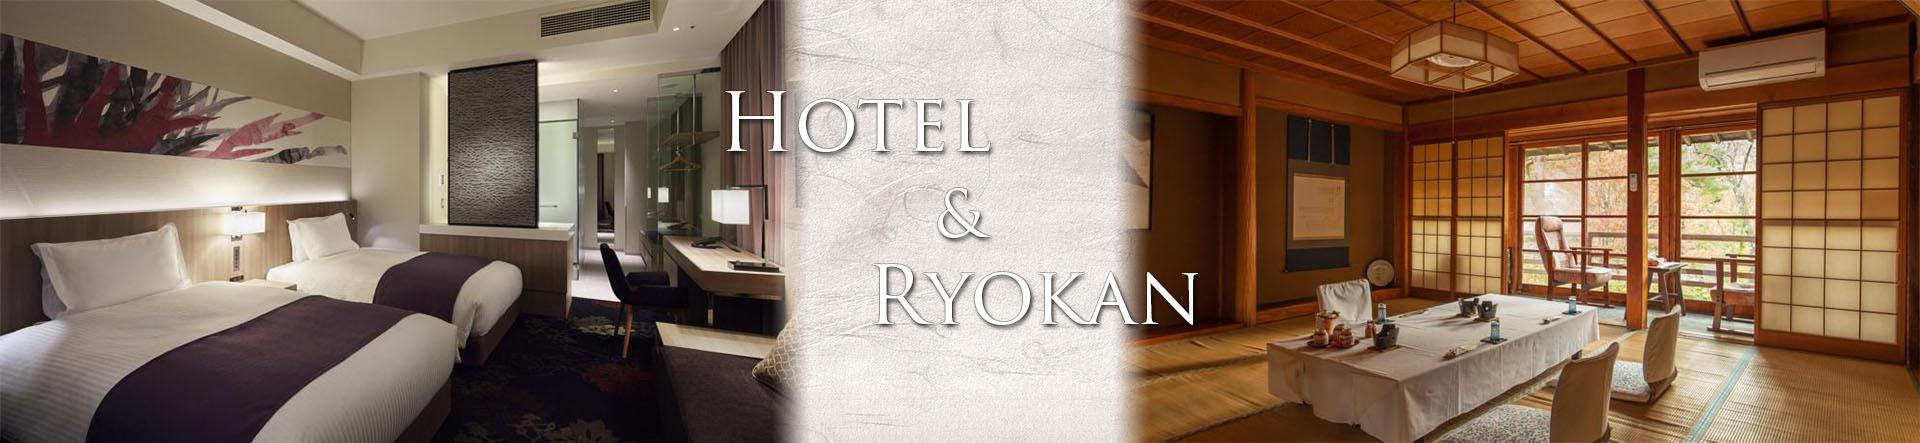 hotel e ryokan